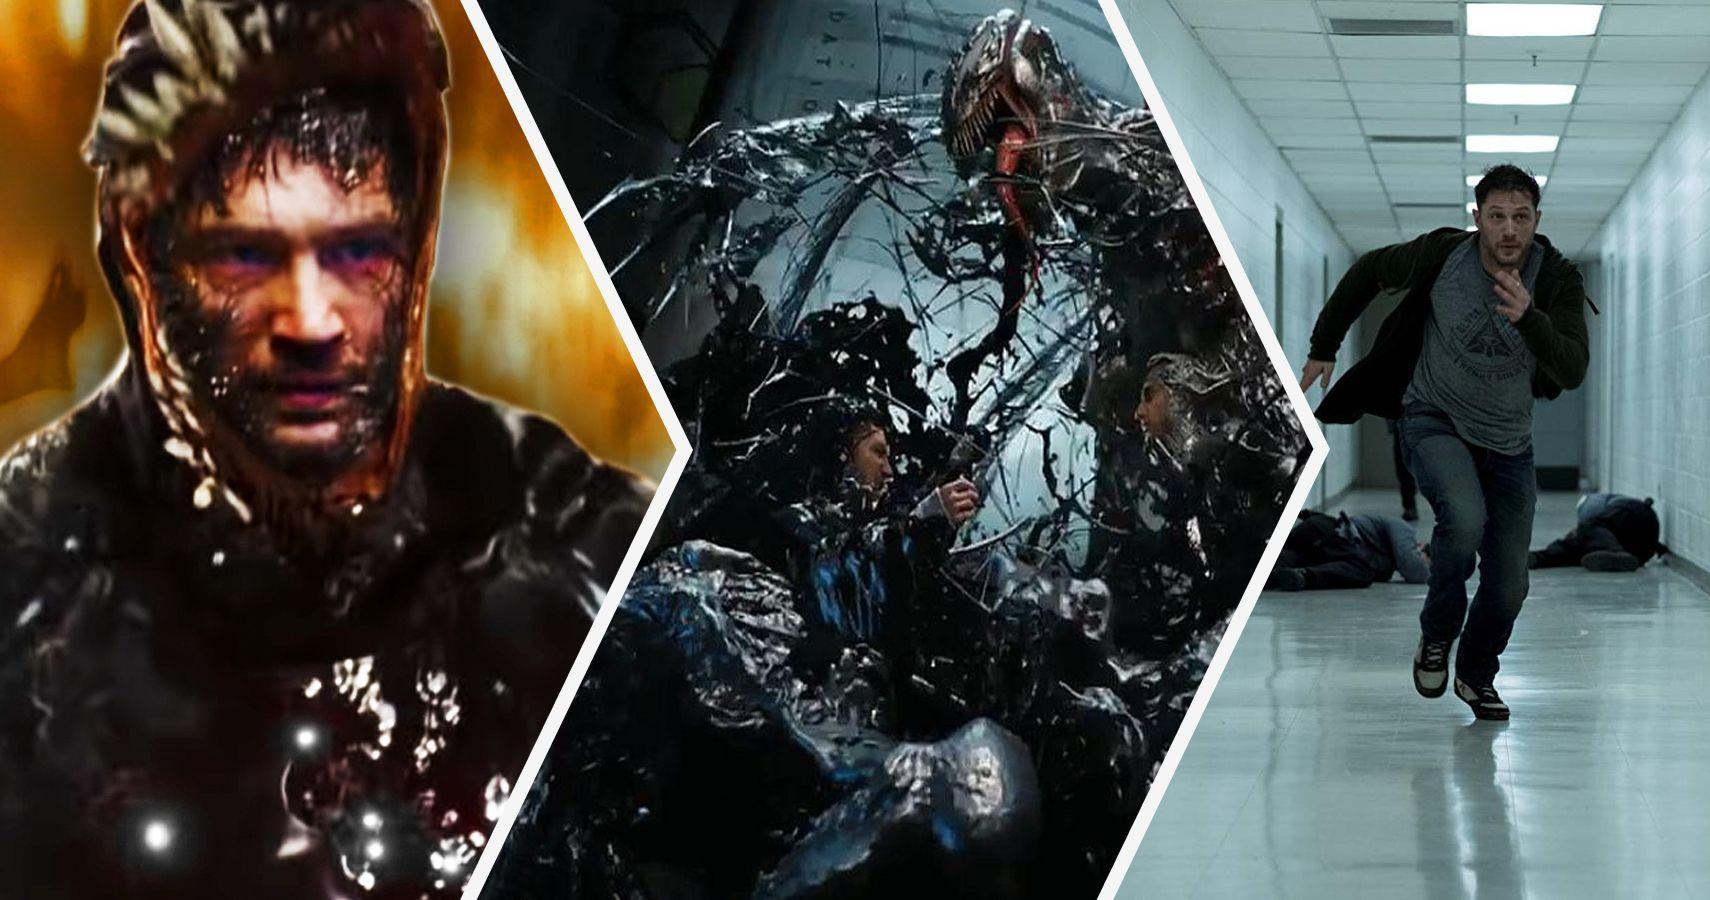 25 Things That Make No Sense About The Venom Movie Screenrant